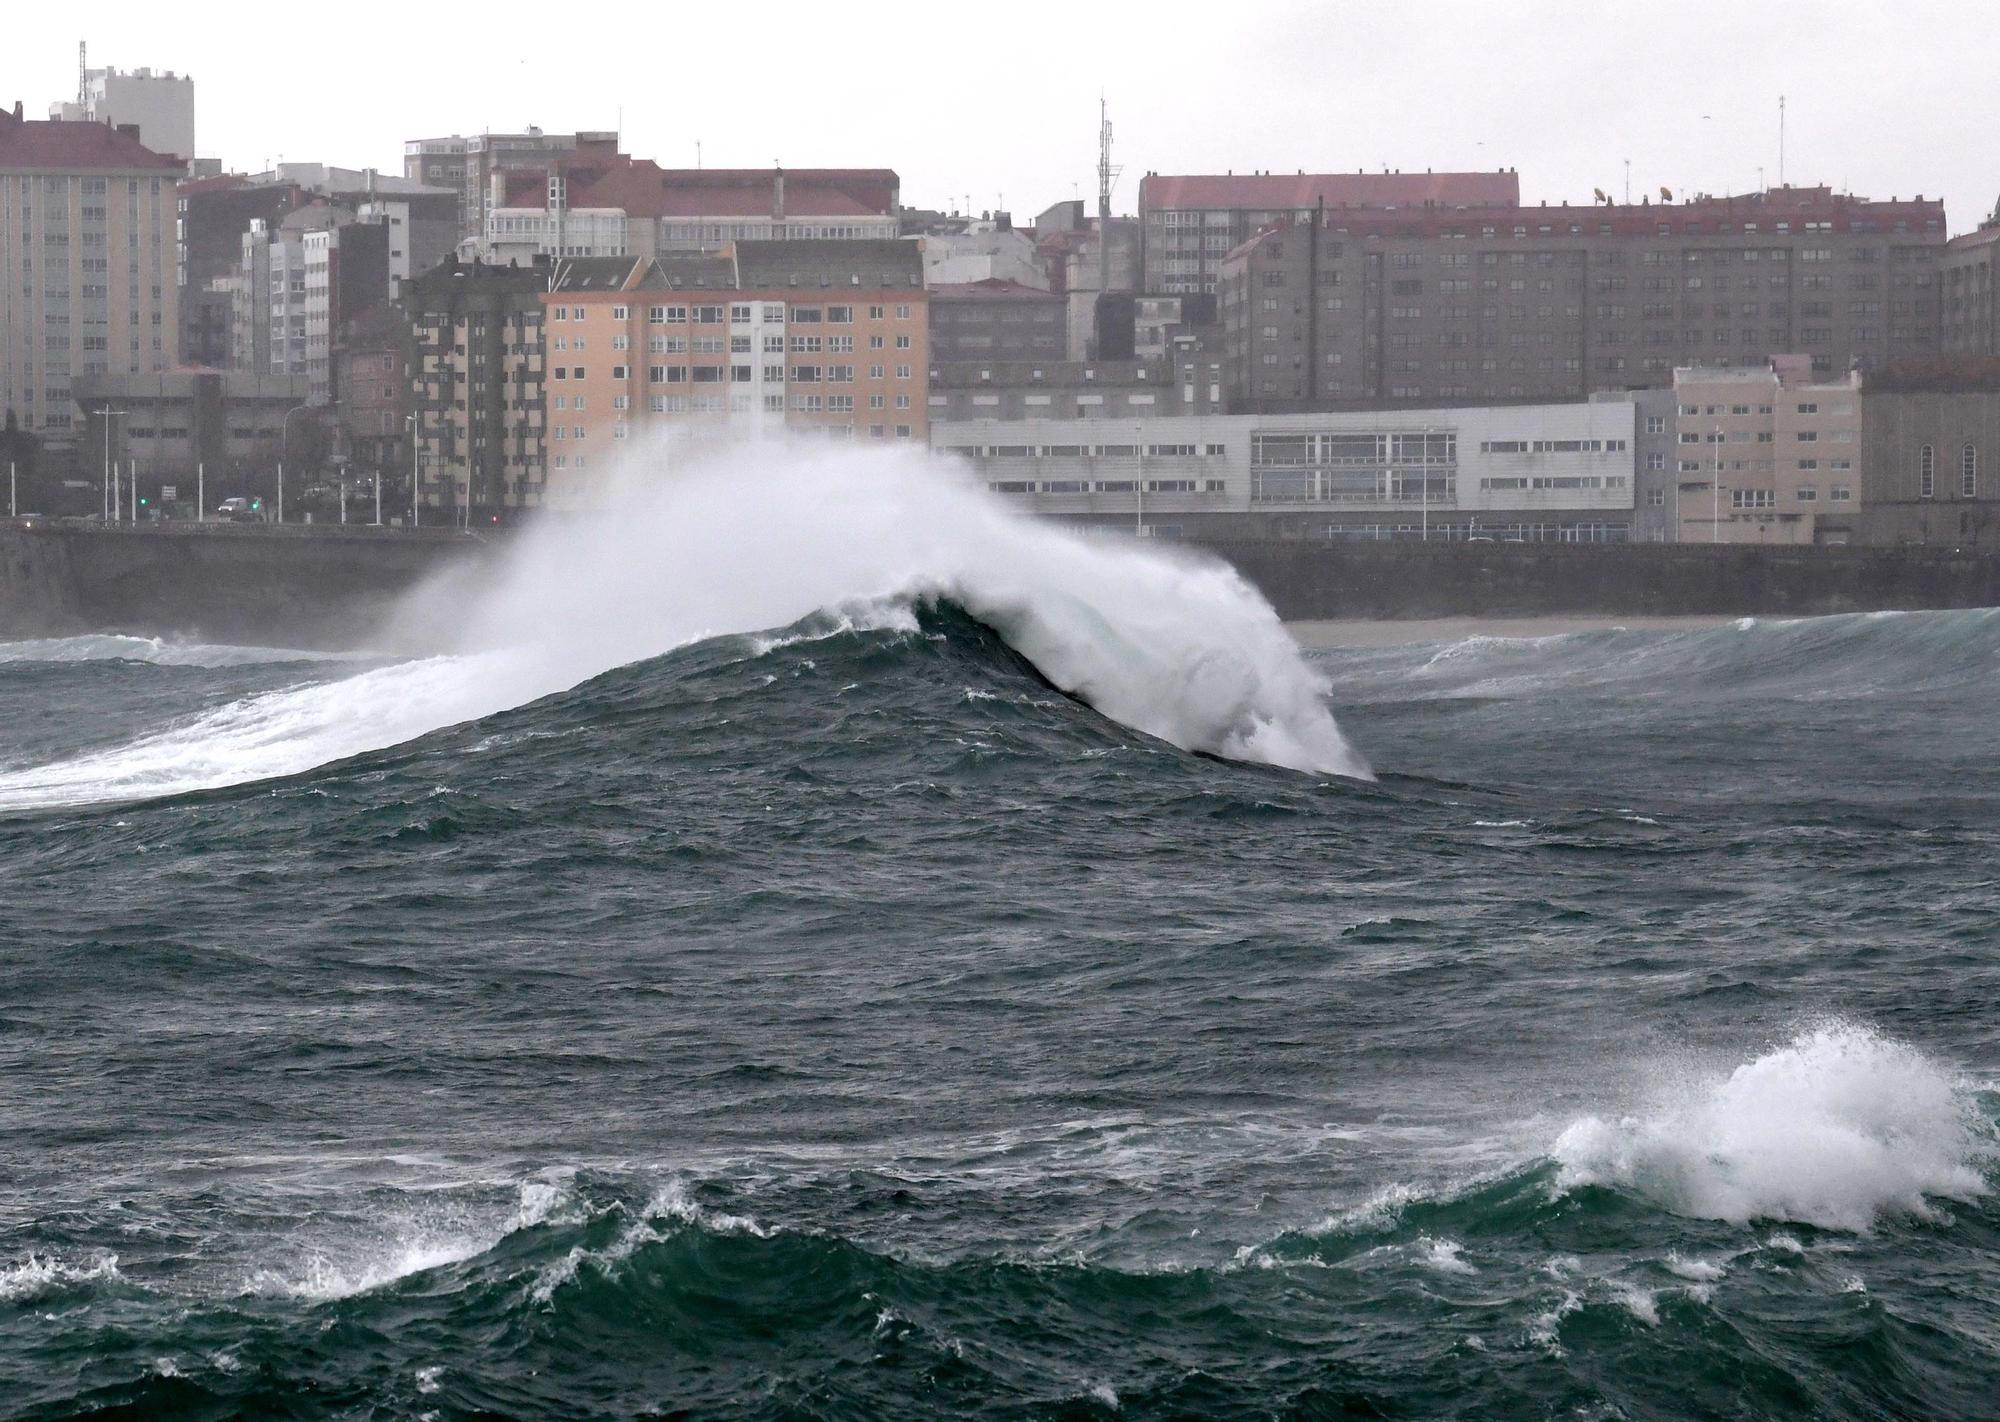 La borrasca 'Bella' azota A Coruña